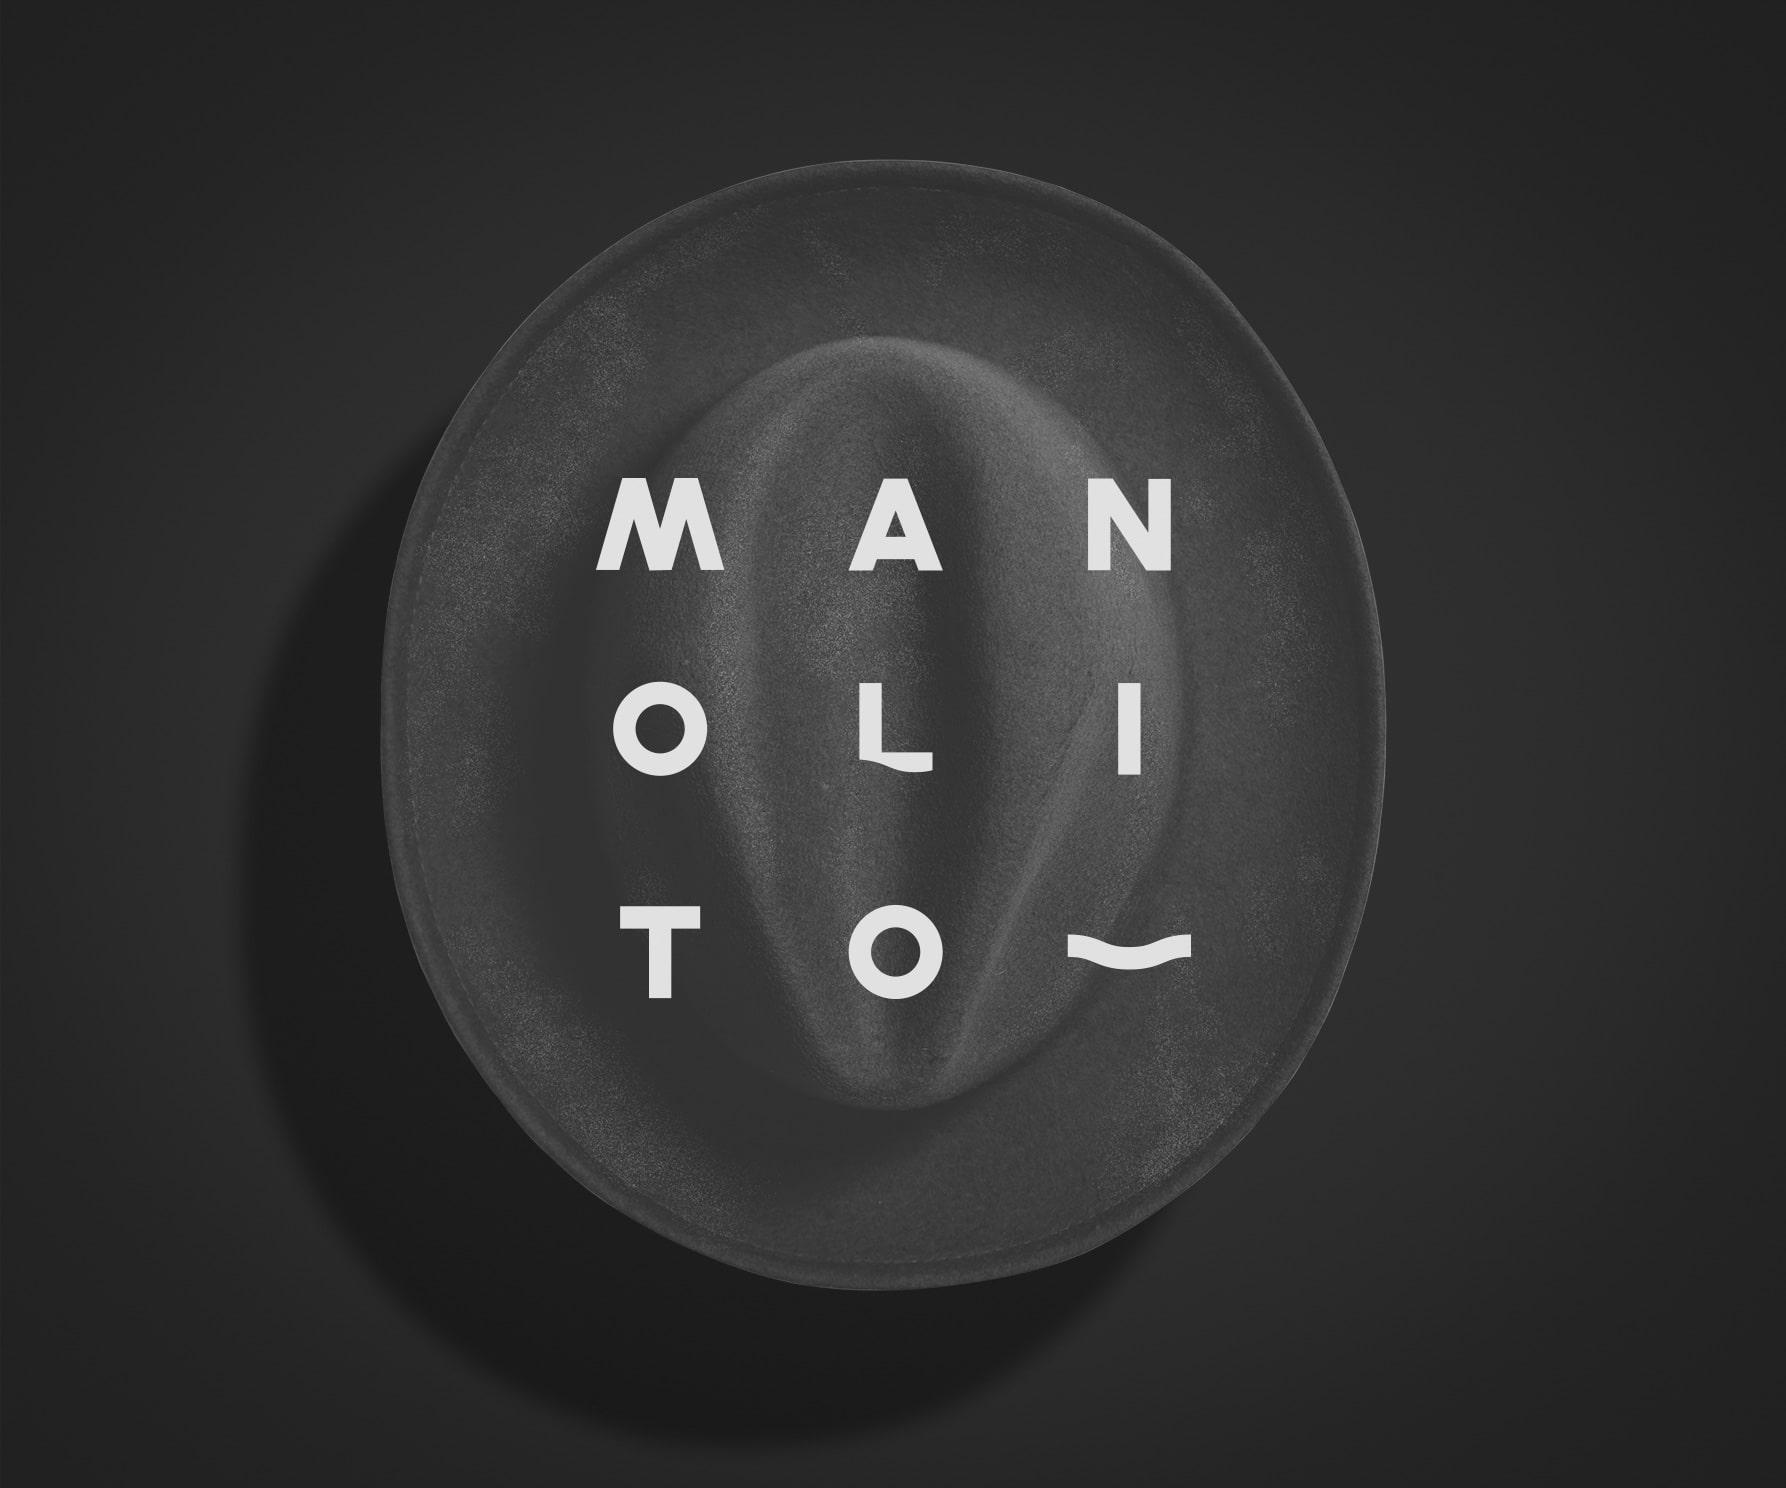 Manolito